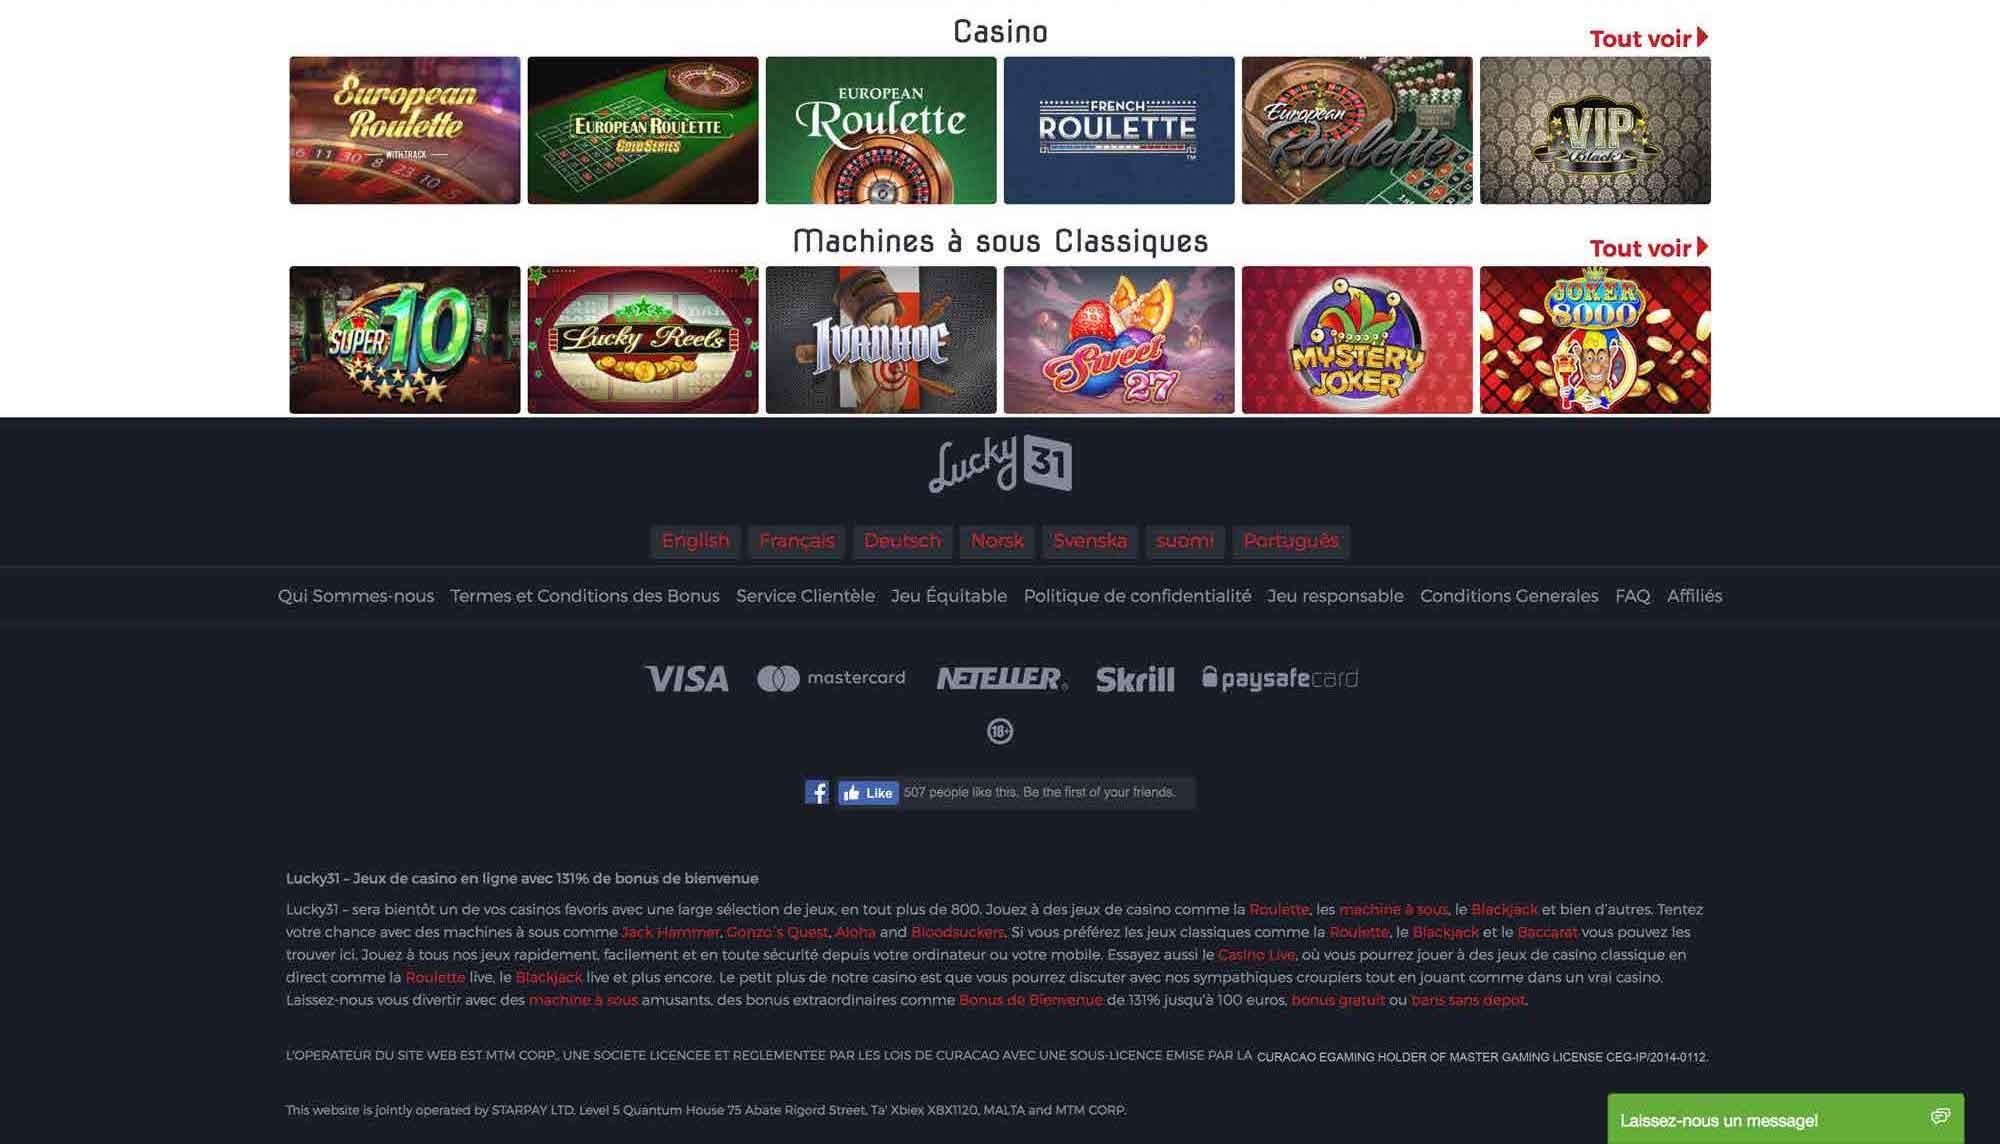 Lucky 31 casino avis